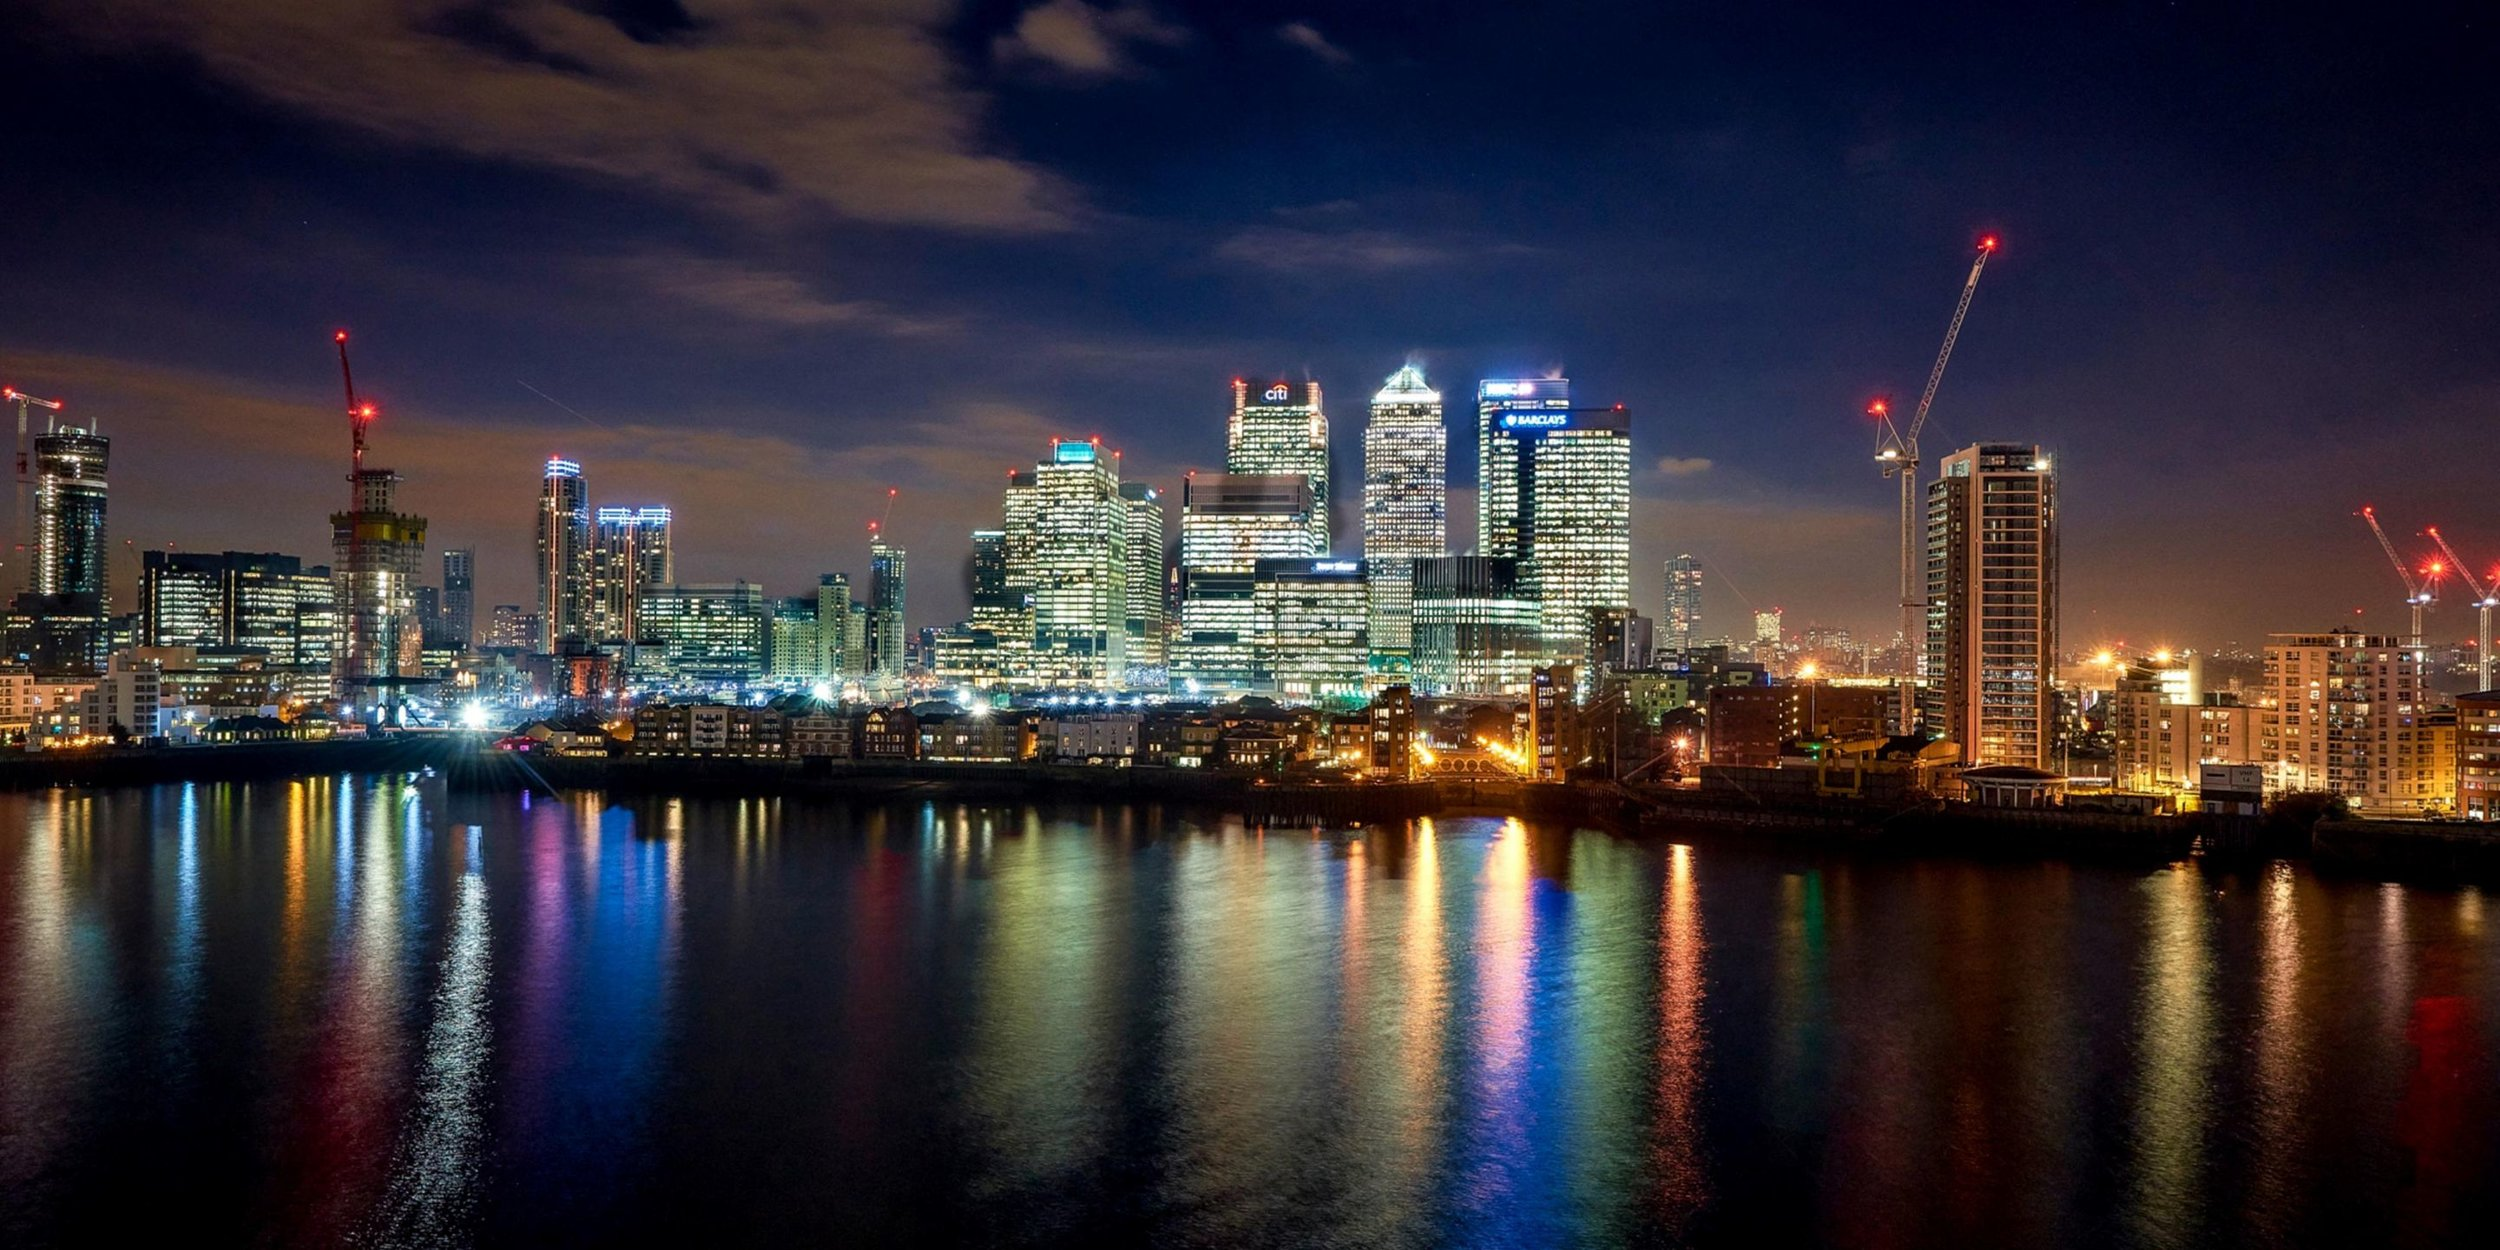 intercontinental-london-4376516466-2x1.jpg